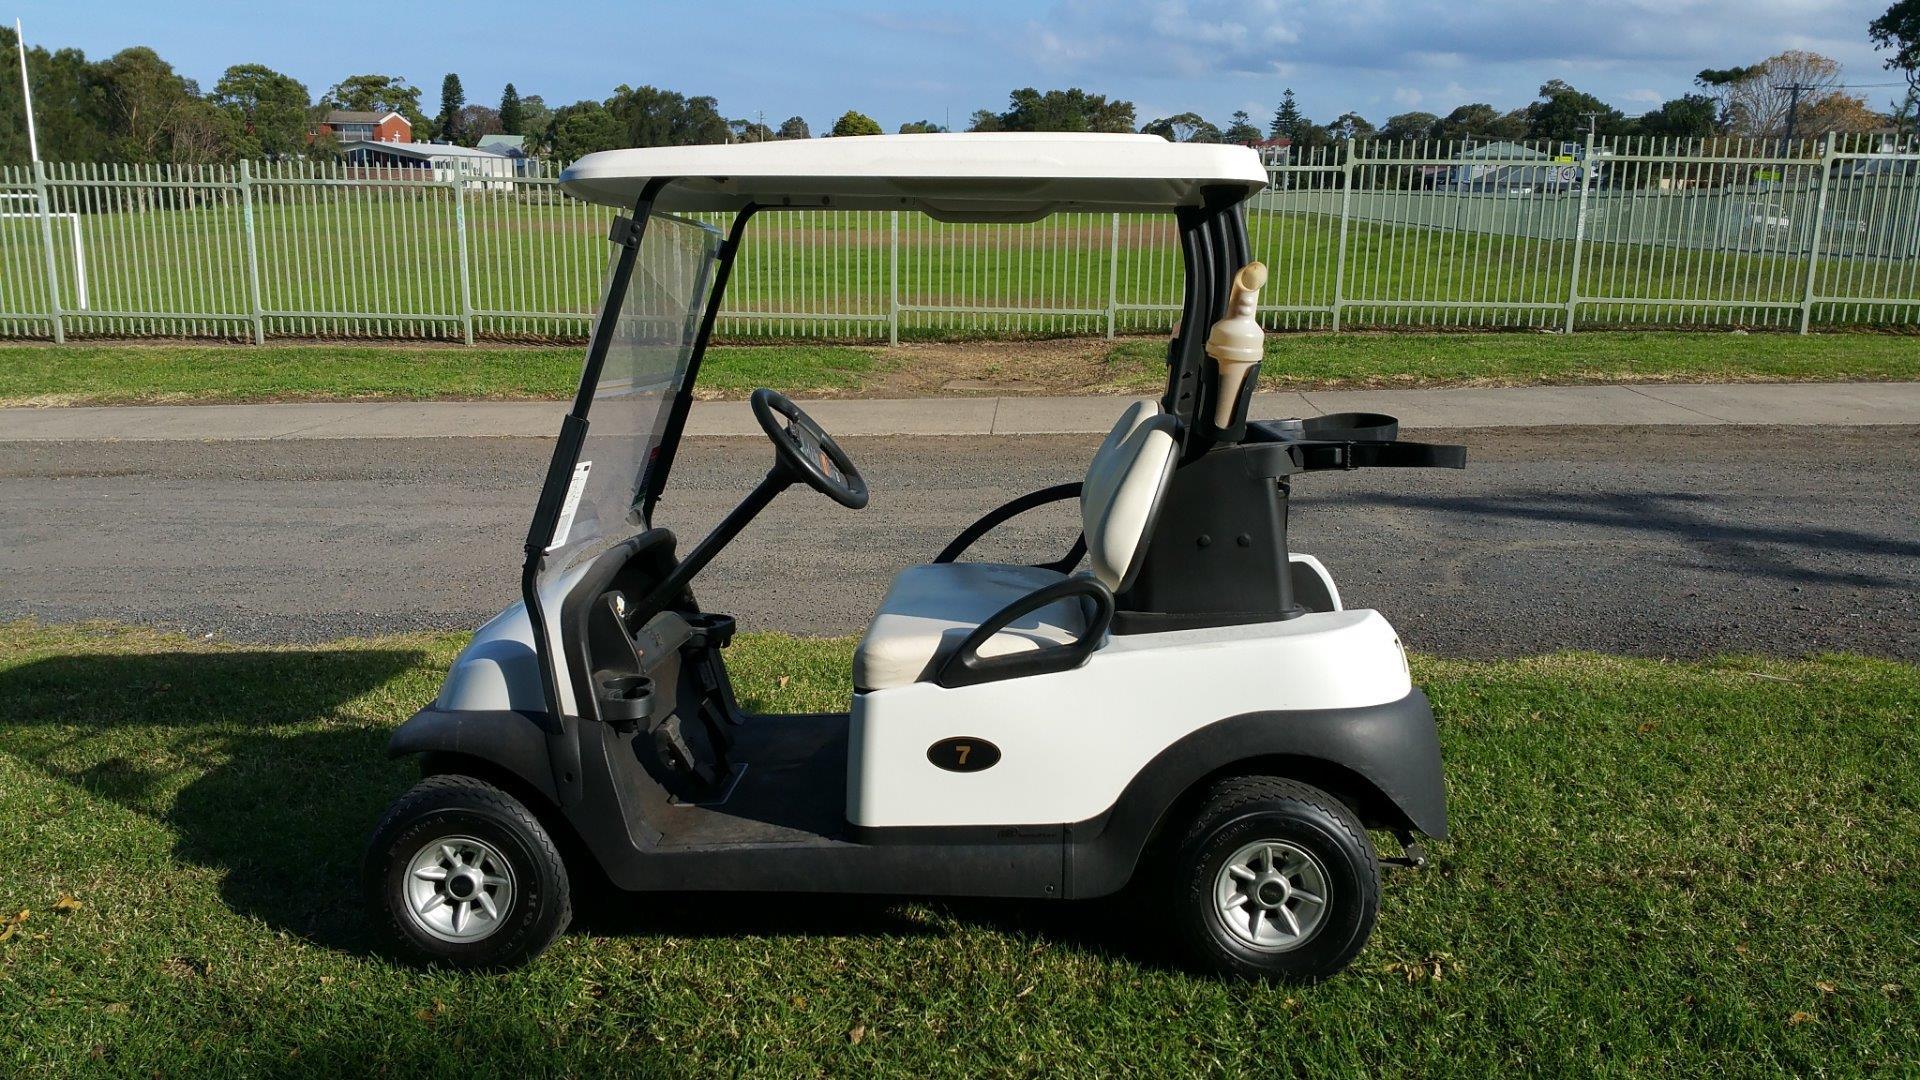 Used 2015 Club Car Precedent 48v Electric Golf Cart Kart